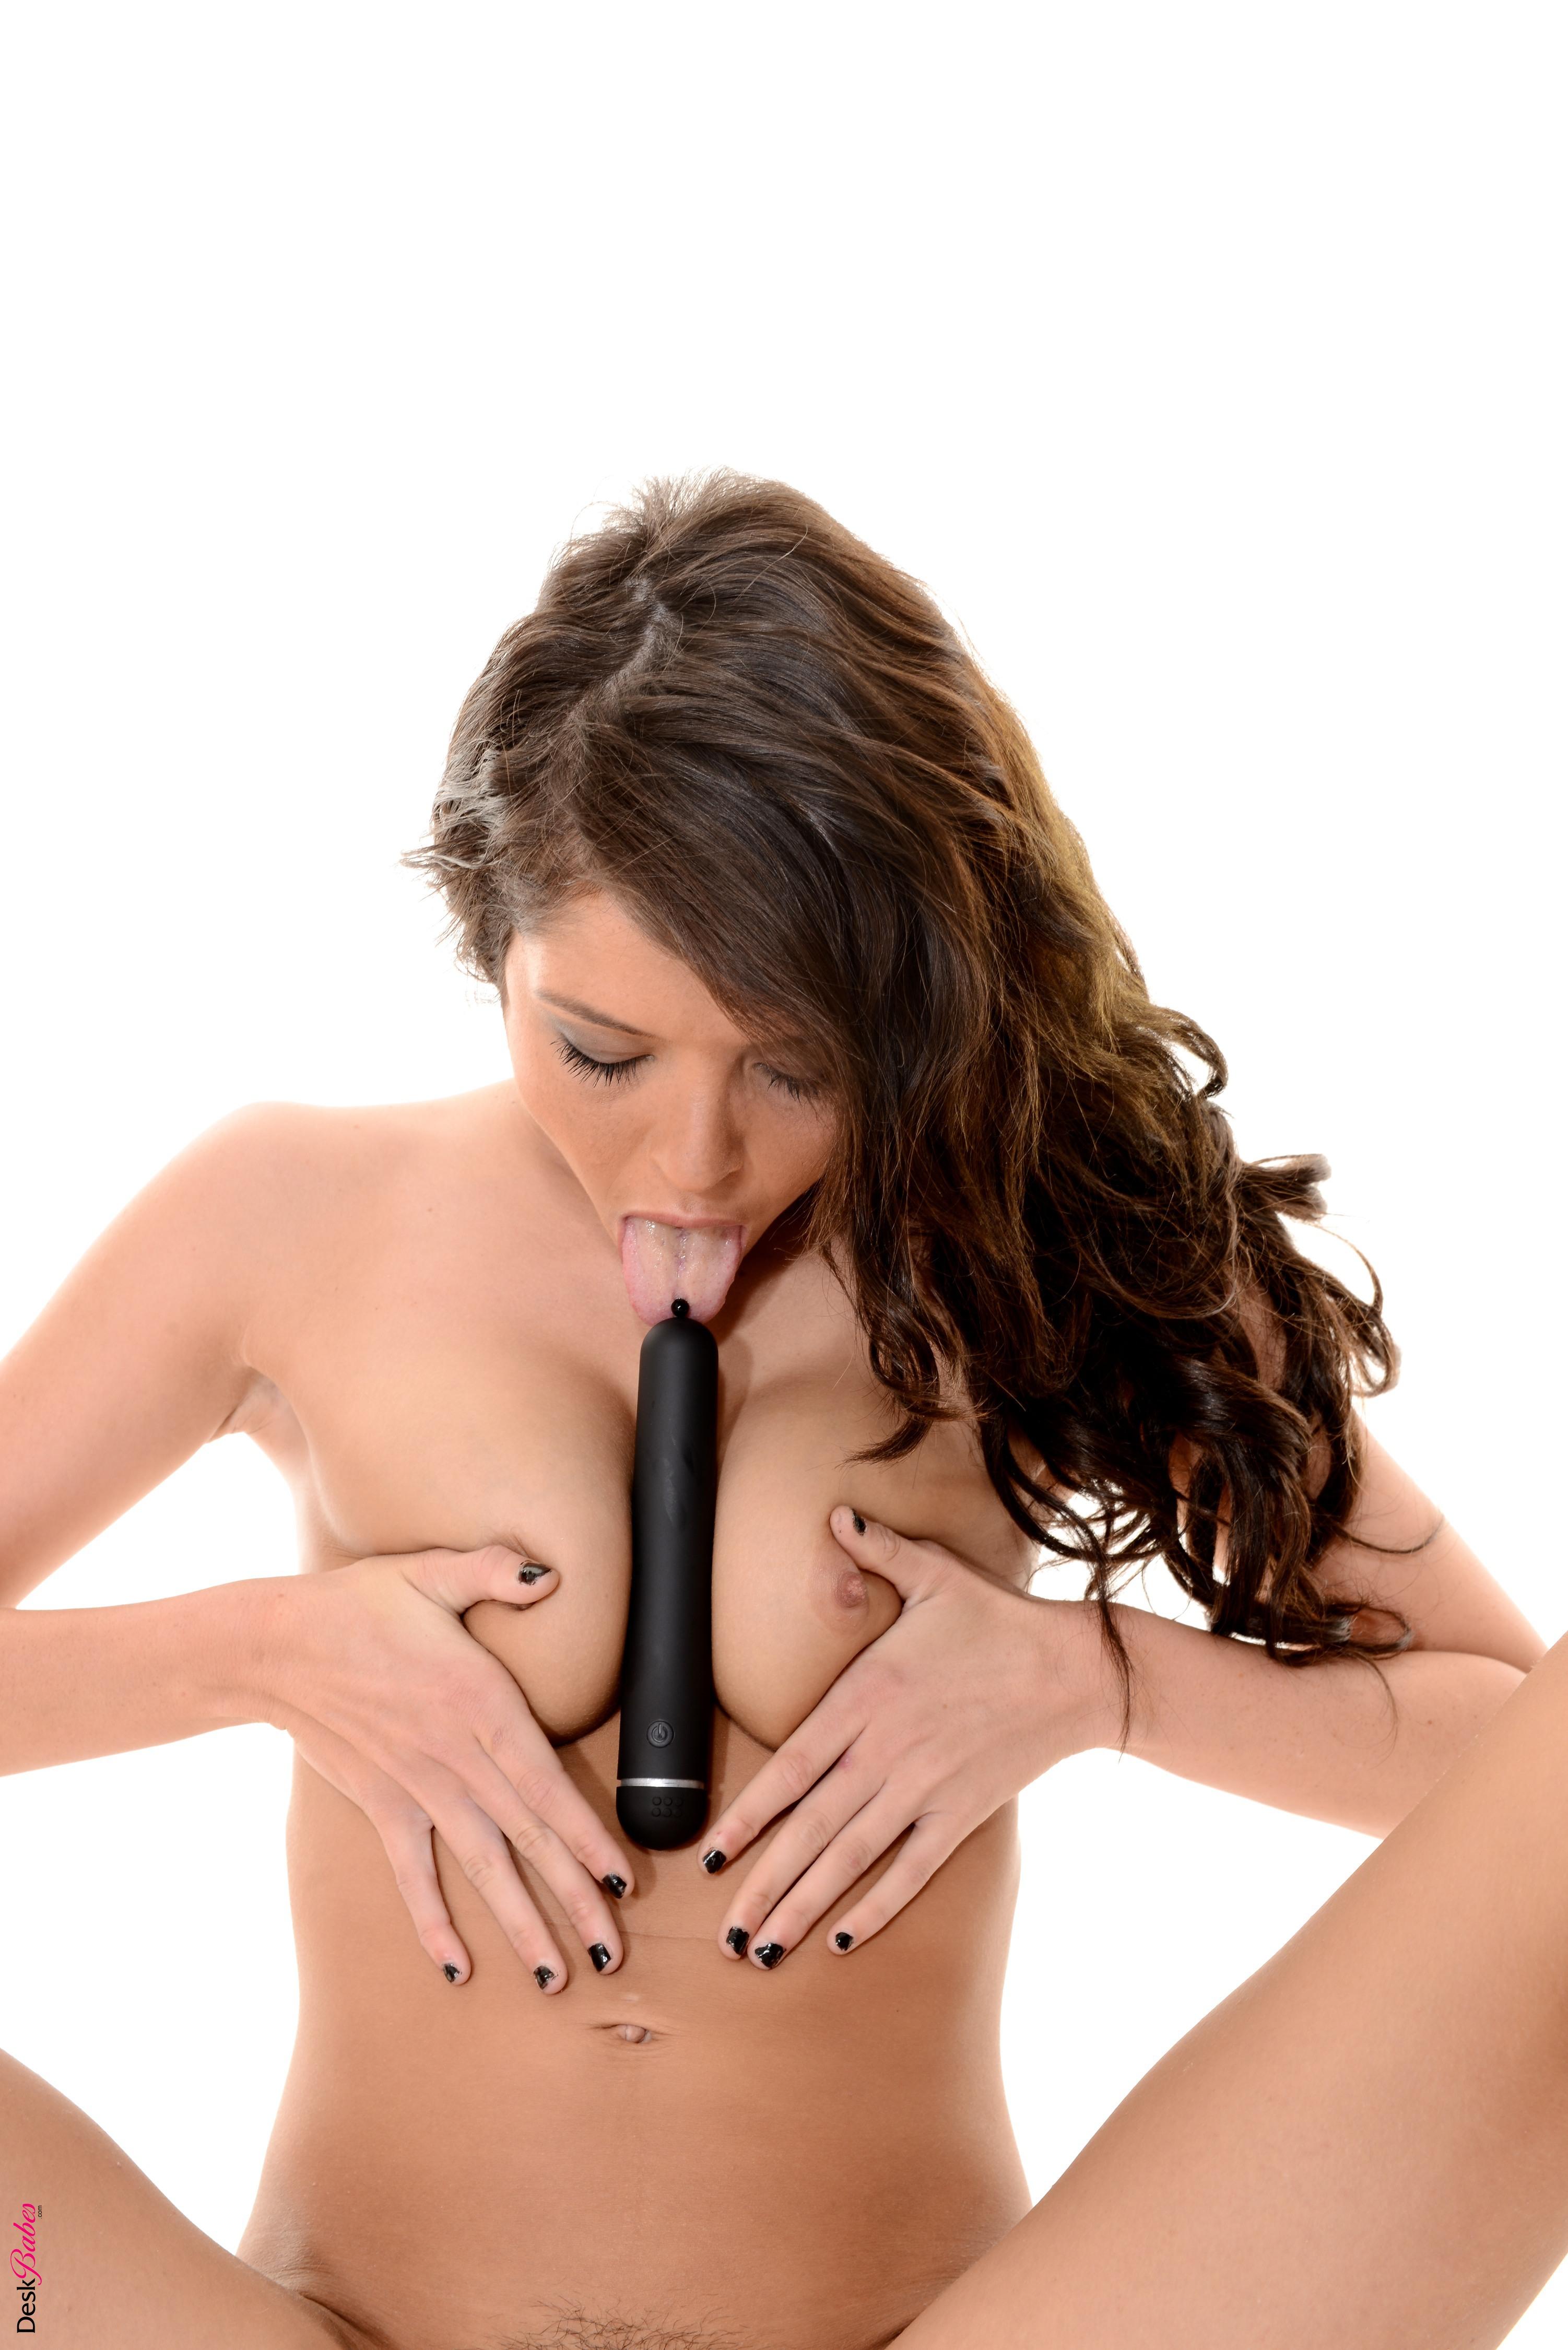 erotic sexy nude women